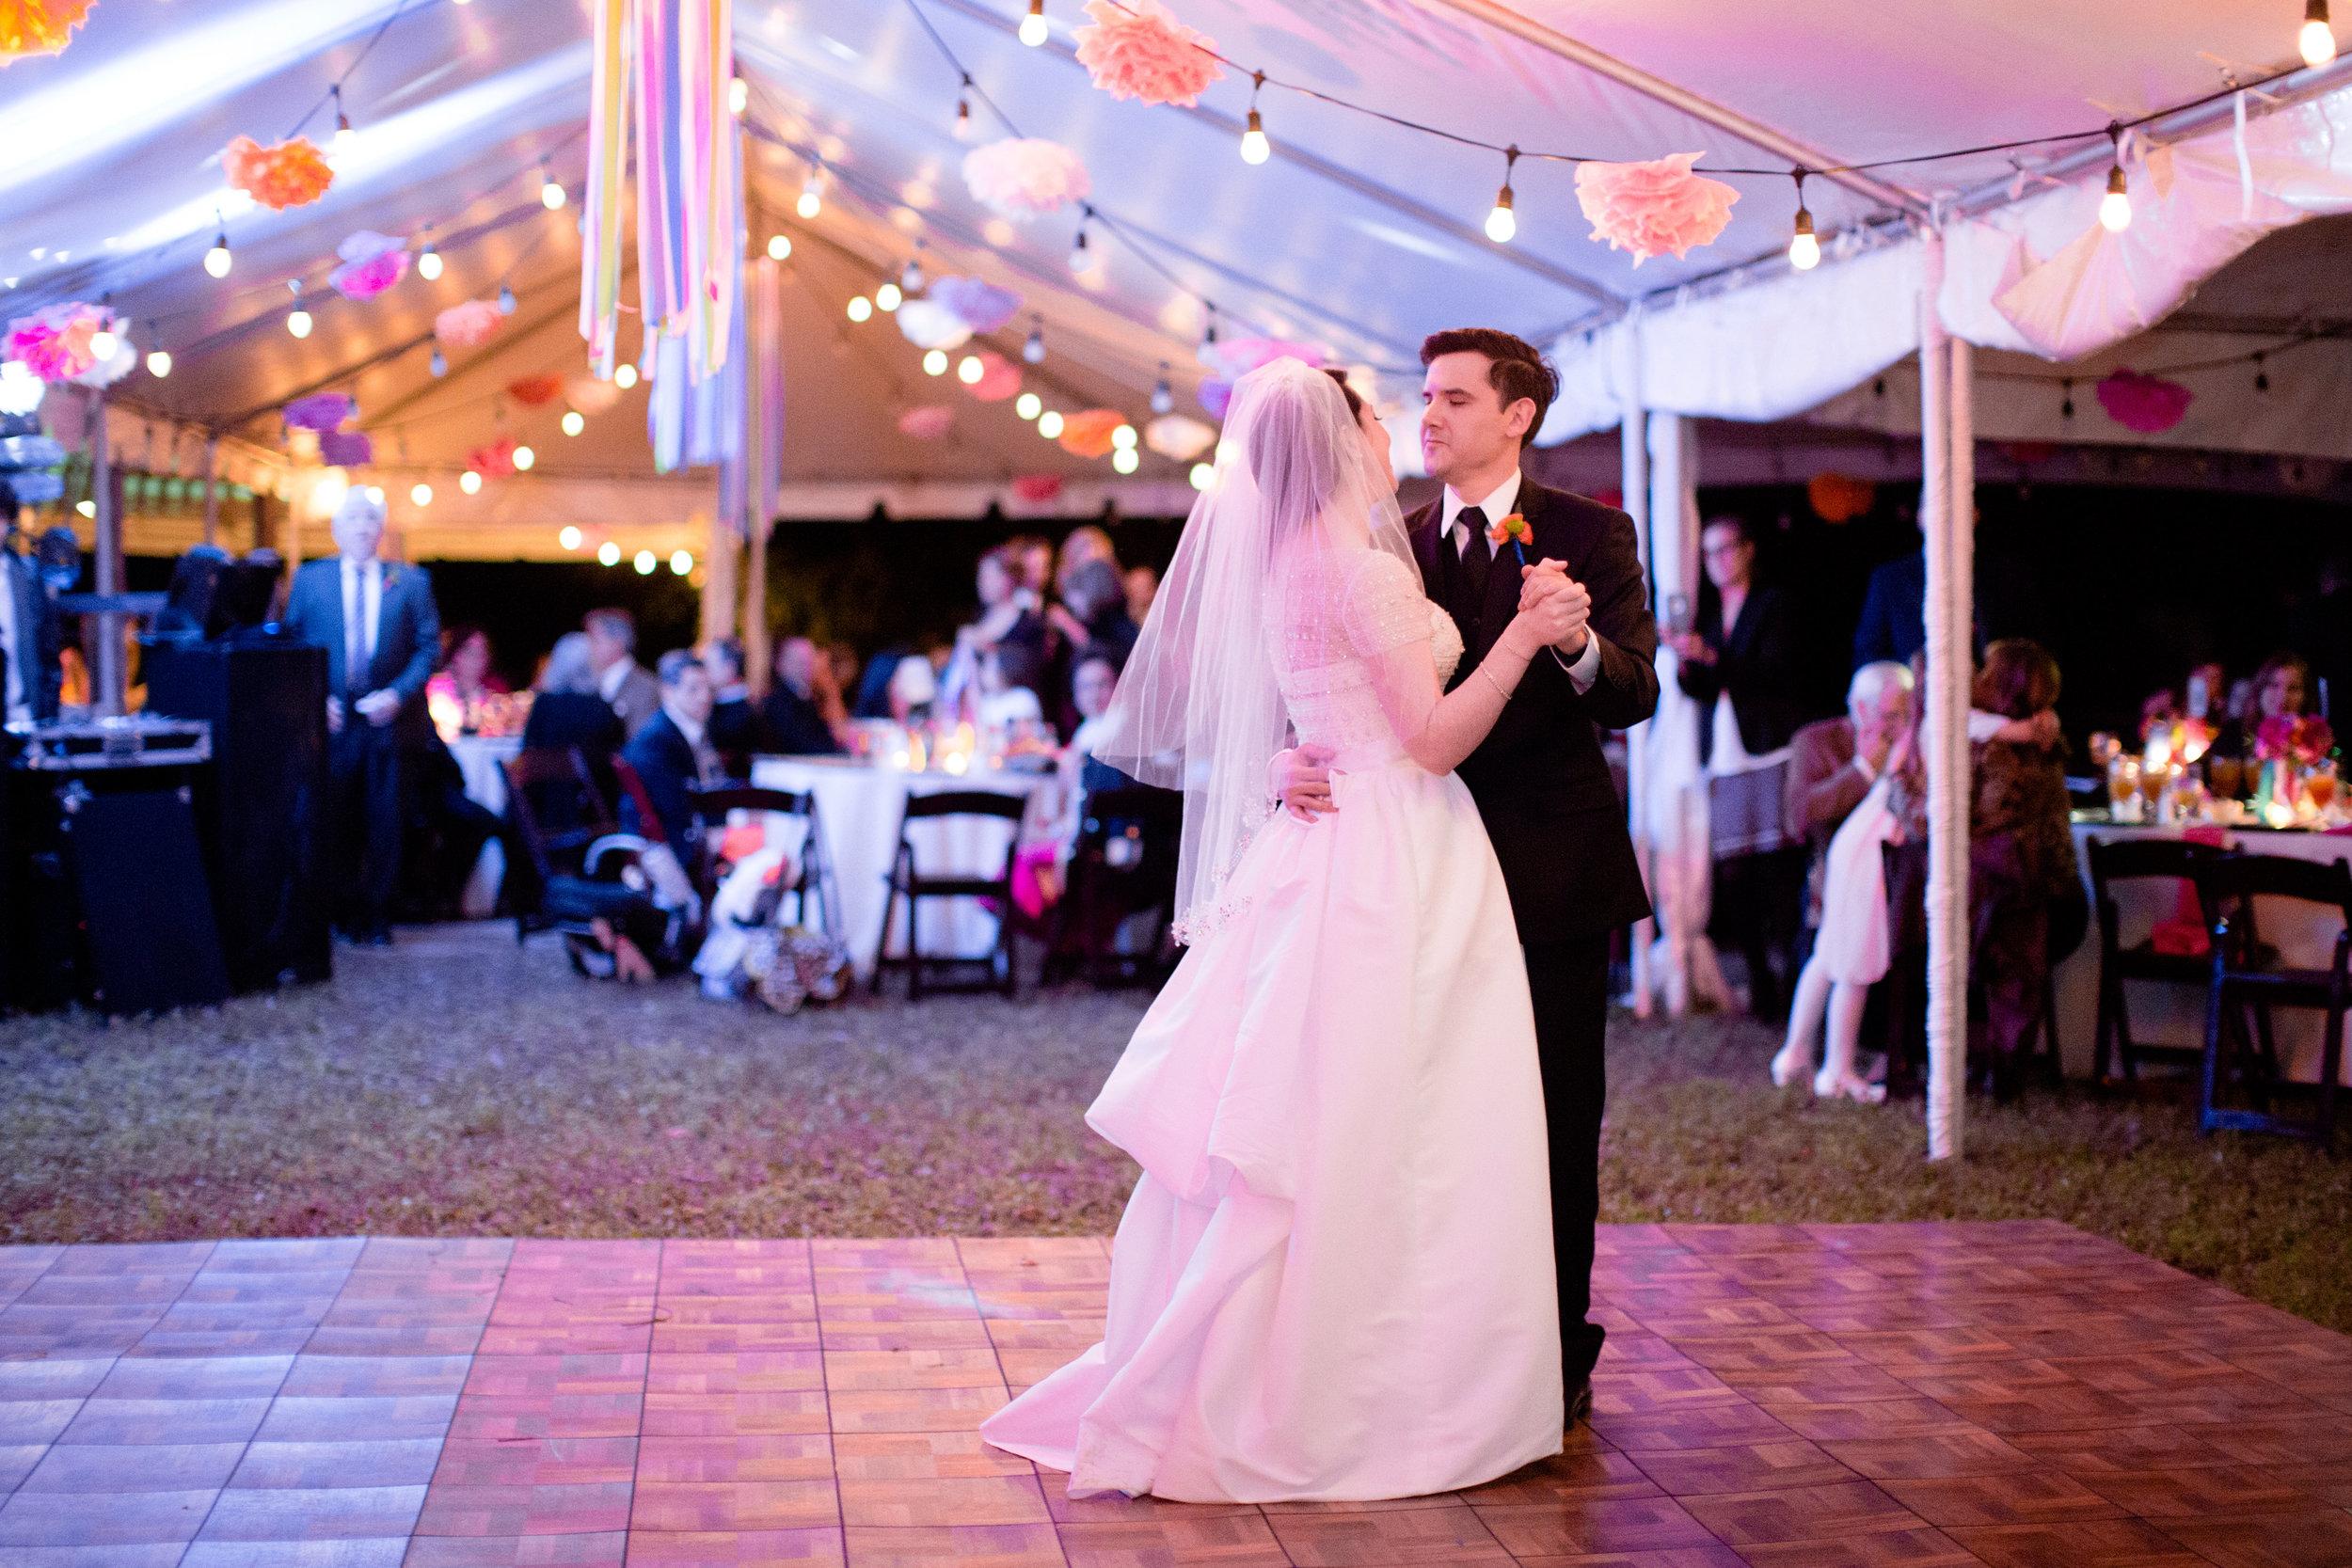 The Lovely Wedding of Emily Carlos-0527.jpg